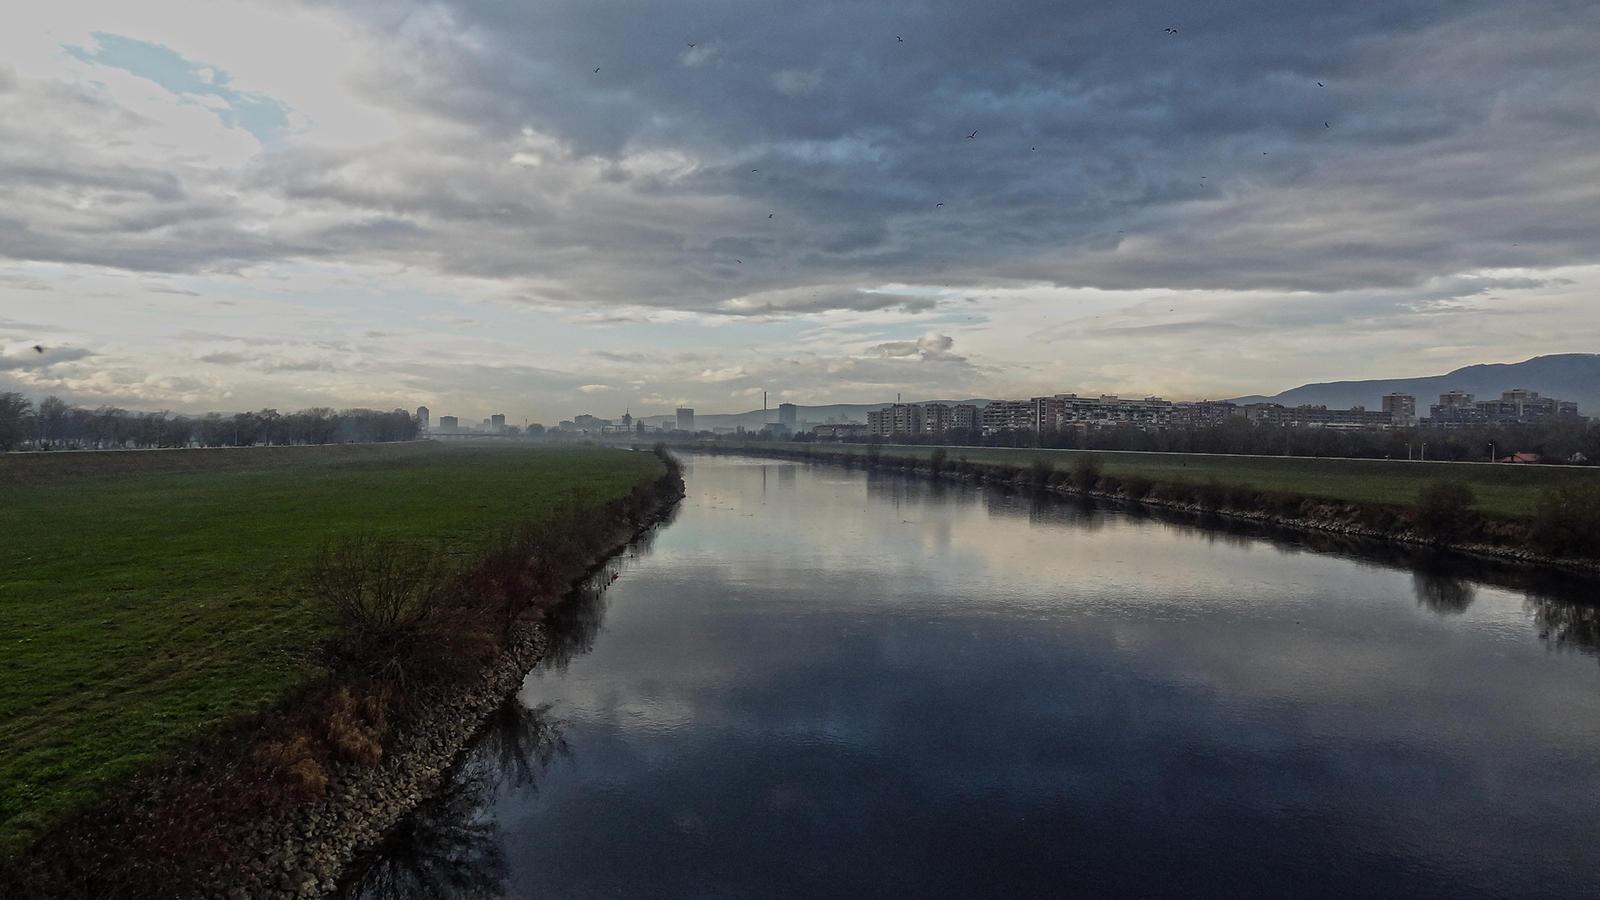 https://img00.deviantart.net/d312/i/2014/042/a/b/sava_river___zagreb_by_sneackeer-d762jce.jpg